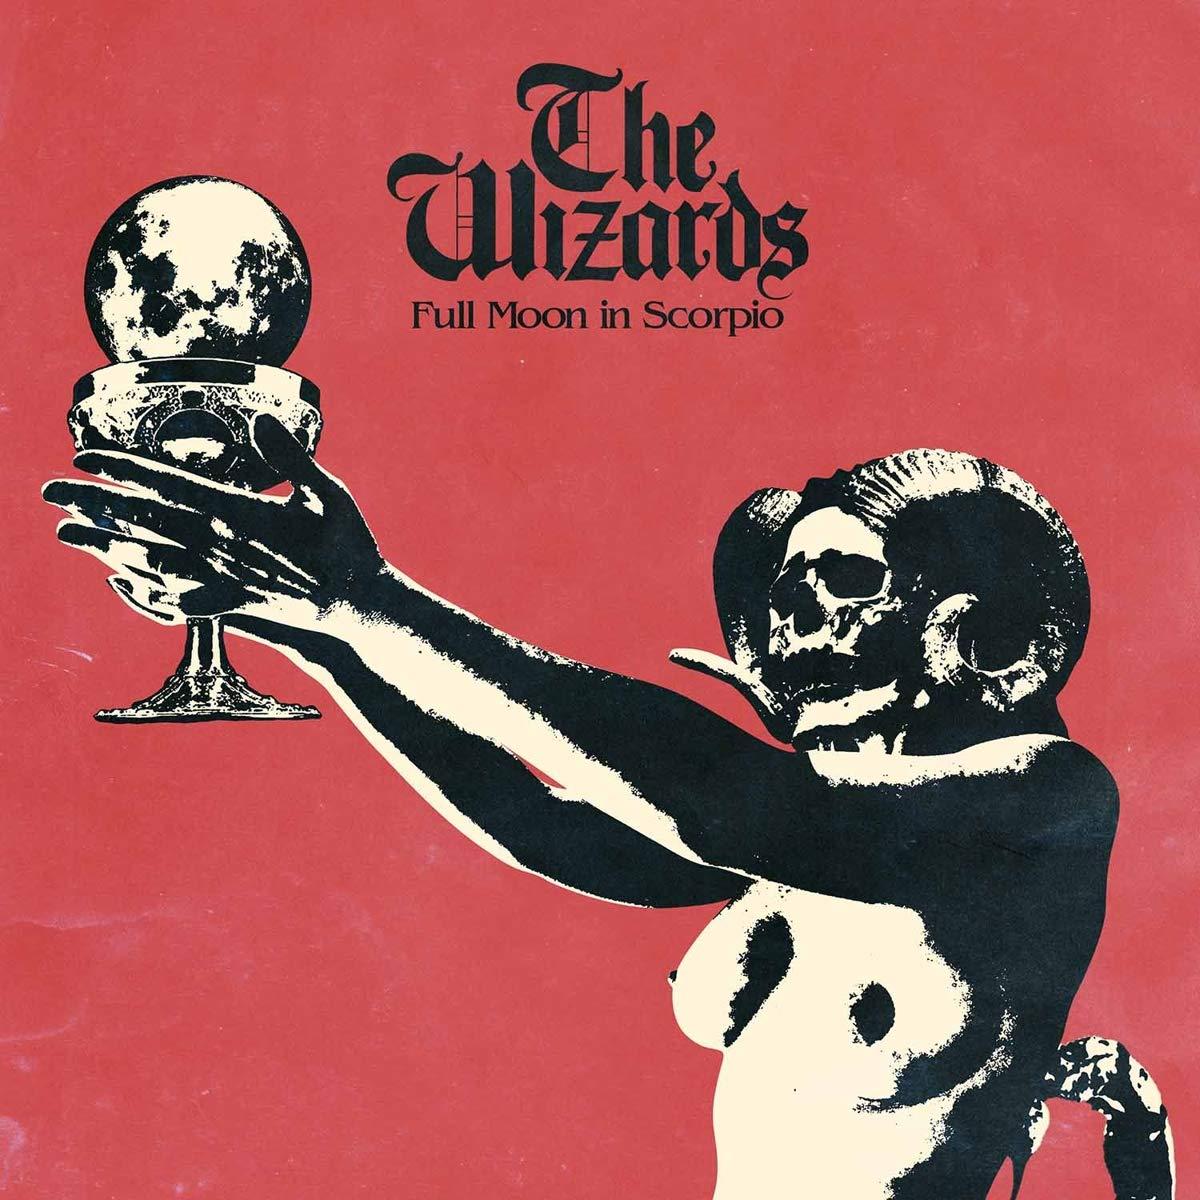 Vinilo : The Wizards - Full Moon In Scorpio (Colored Vinyl, Limited Edition)